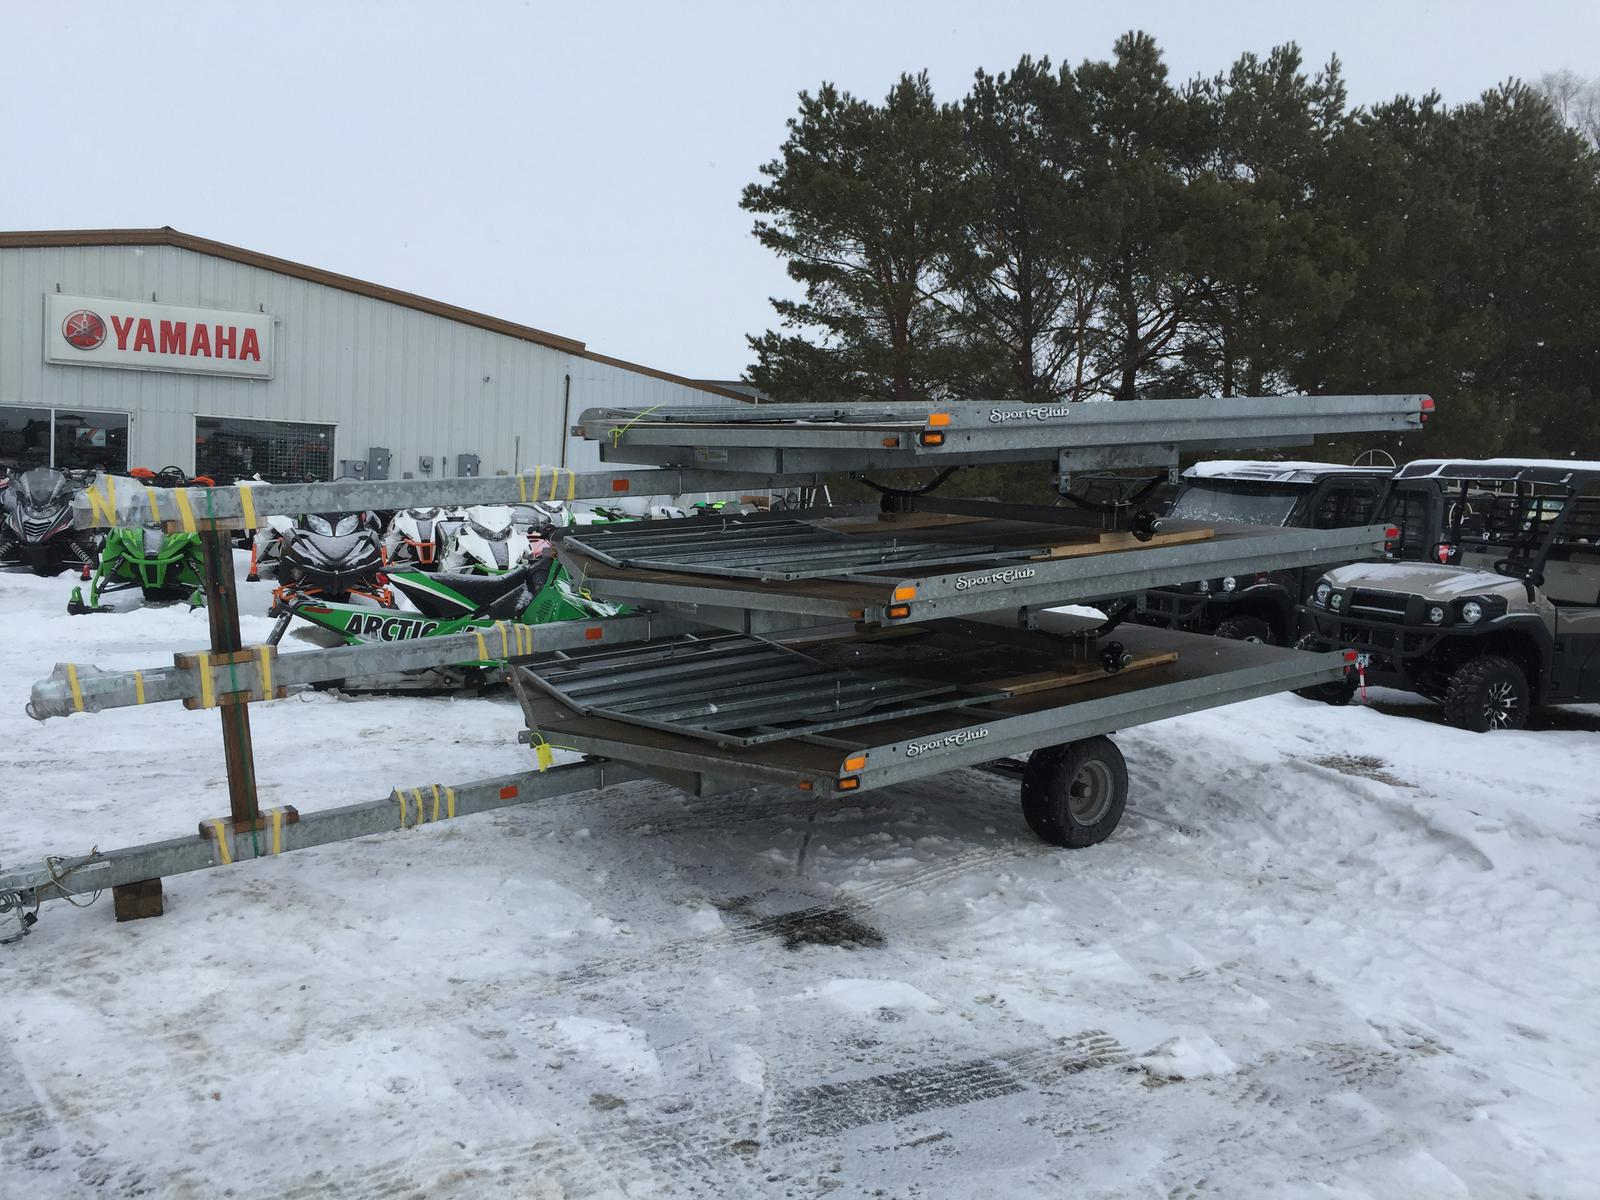 Yacht Club Snowmobile Trailers Trailer Wiring Diagram Drive On Off 1600x1200